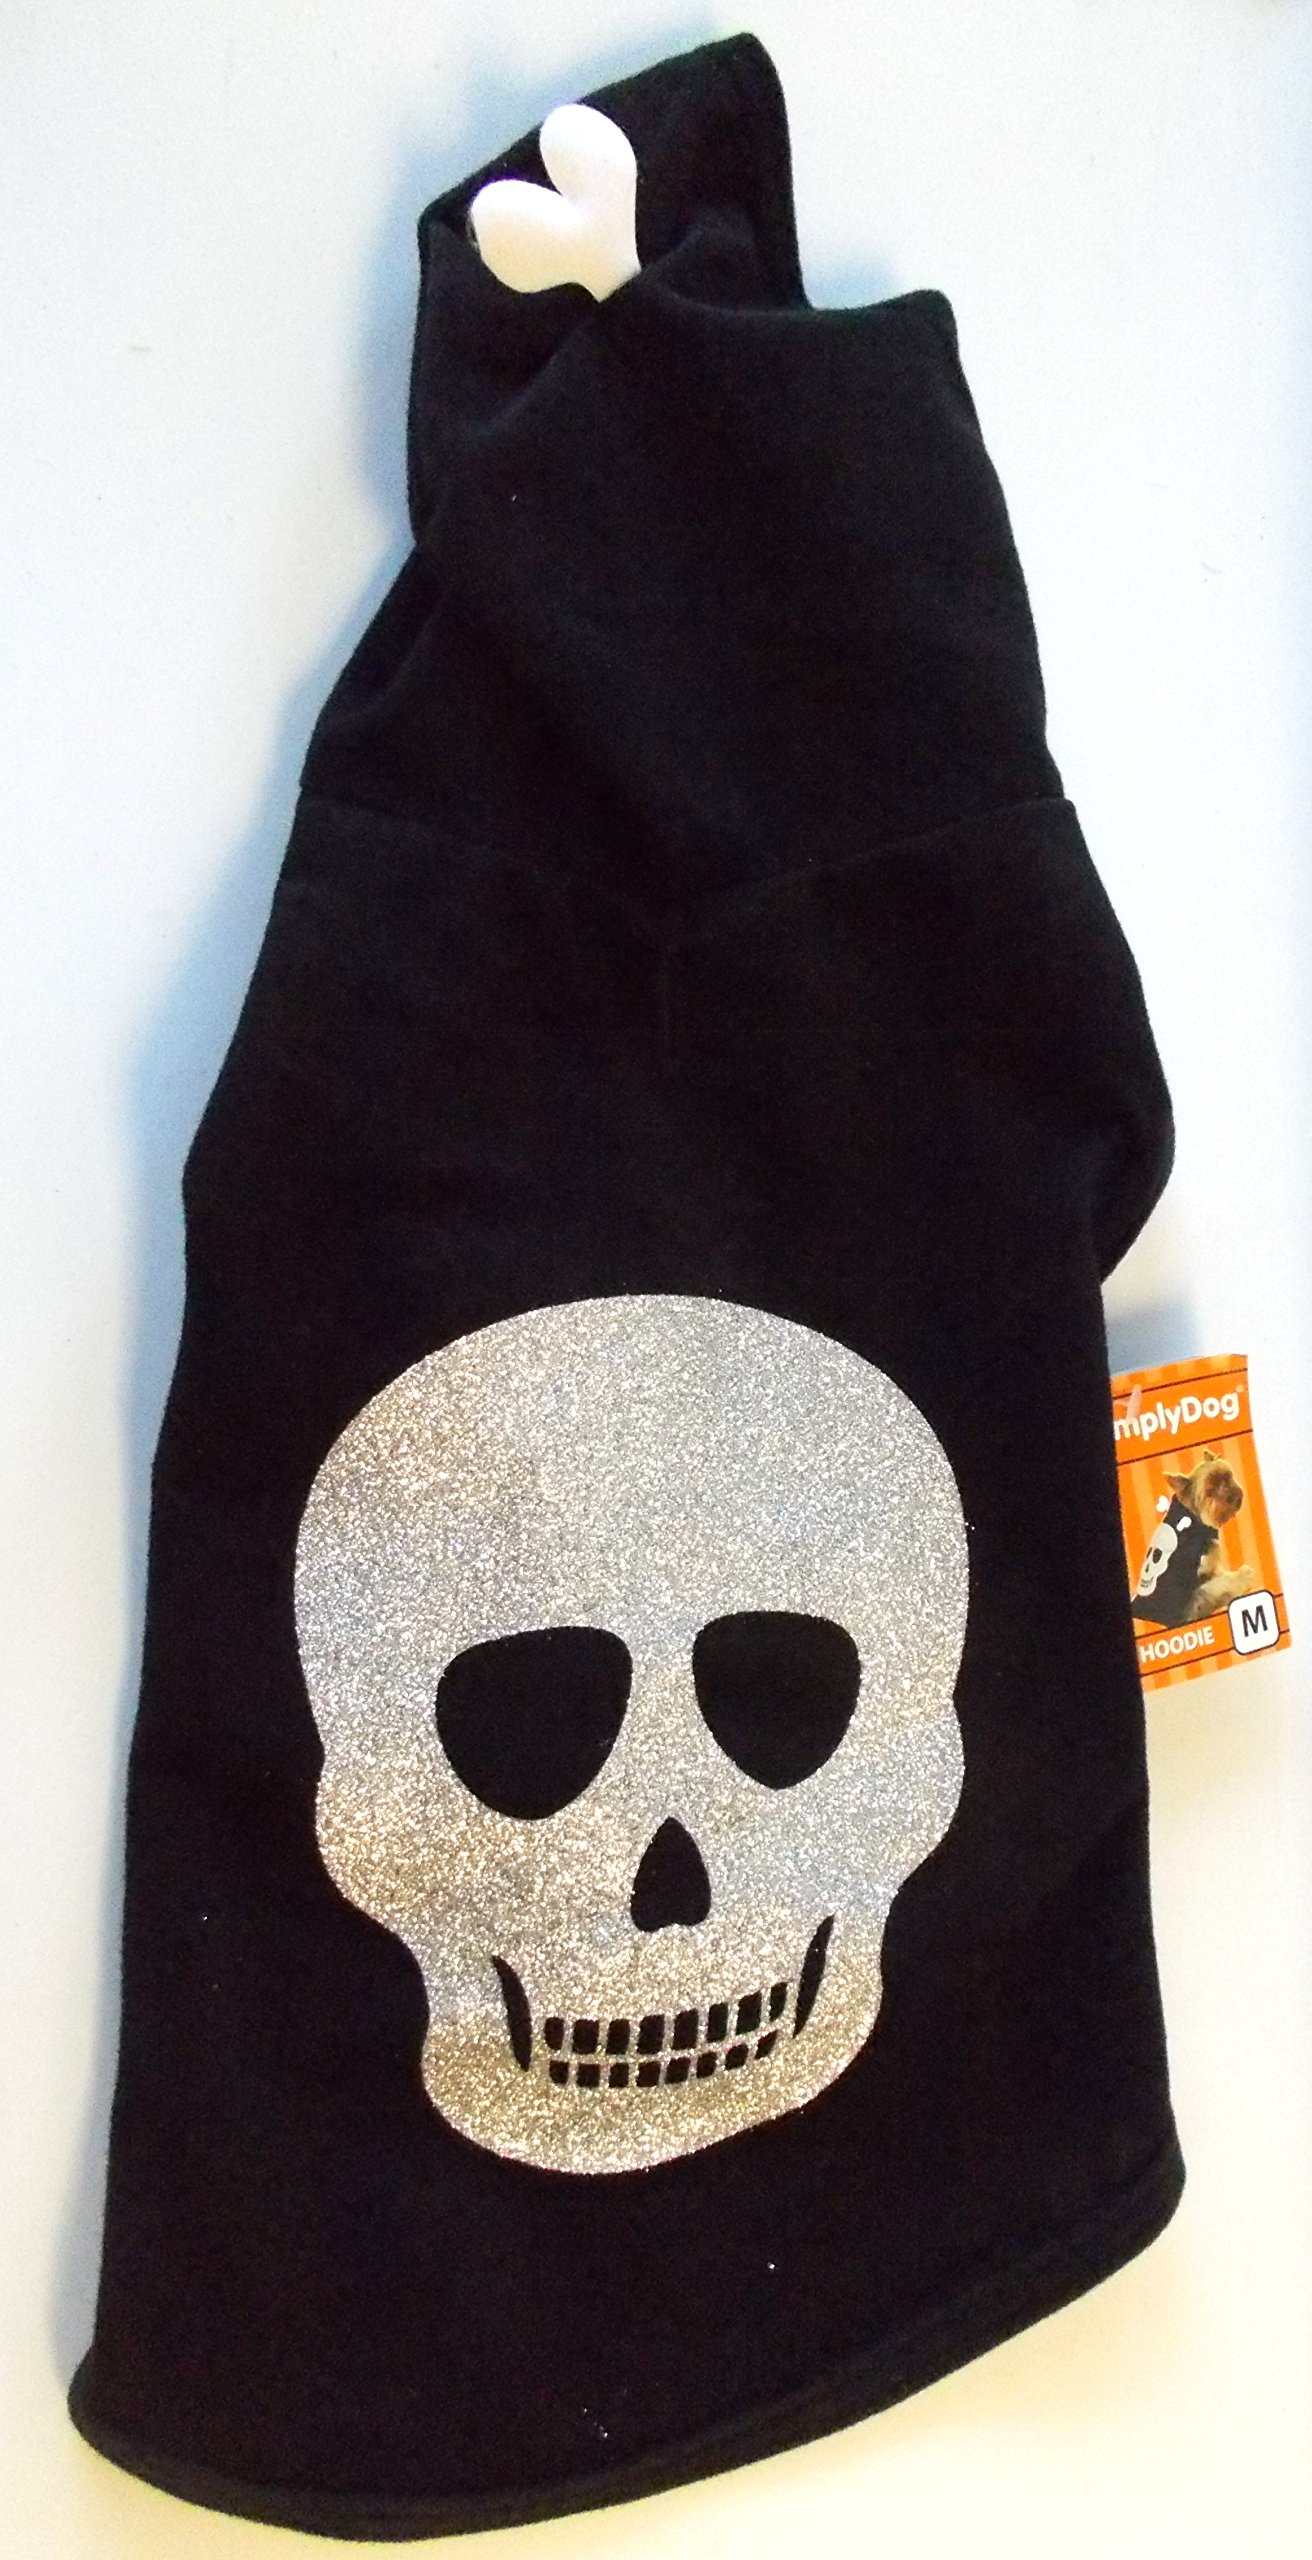 Skeleton Skull Black Silver Glitter Halloween Dog Hoodie XS 9-11' NWT